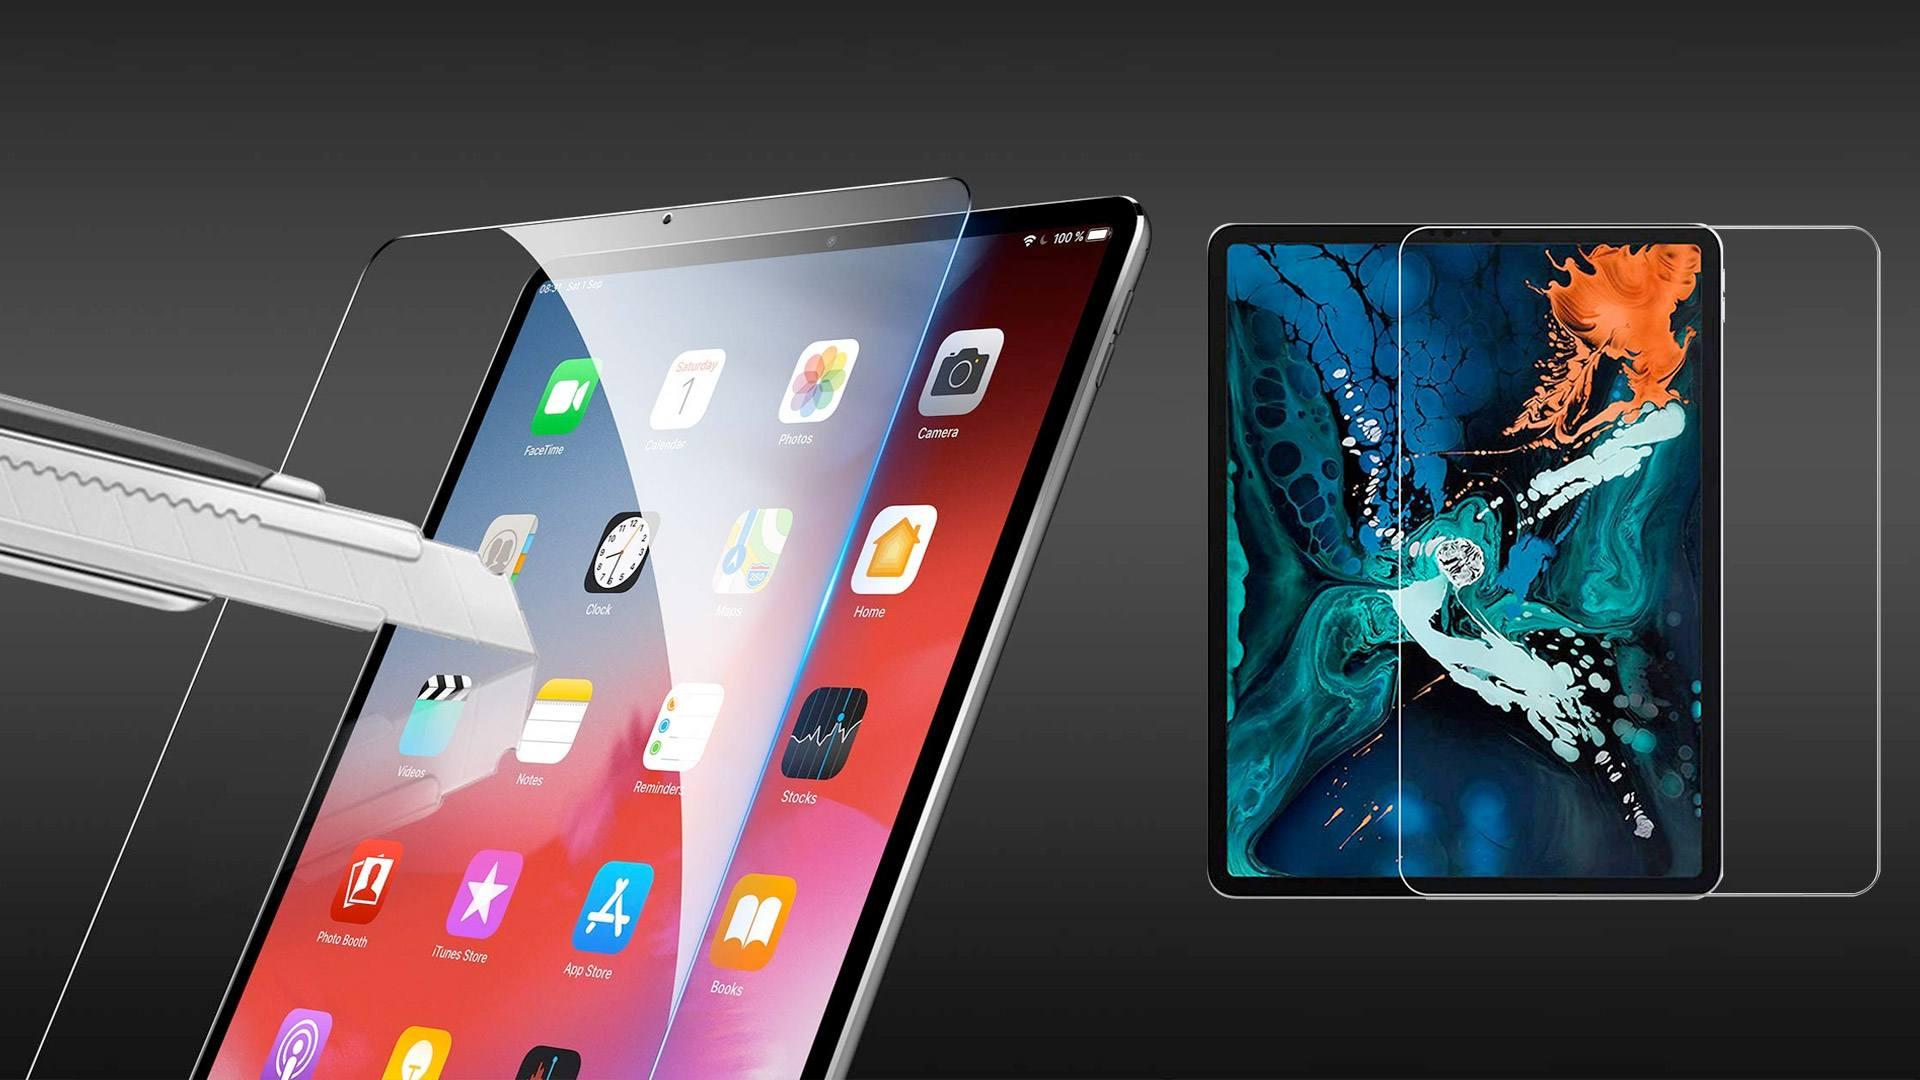 ipad screens just like apple iphone